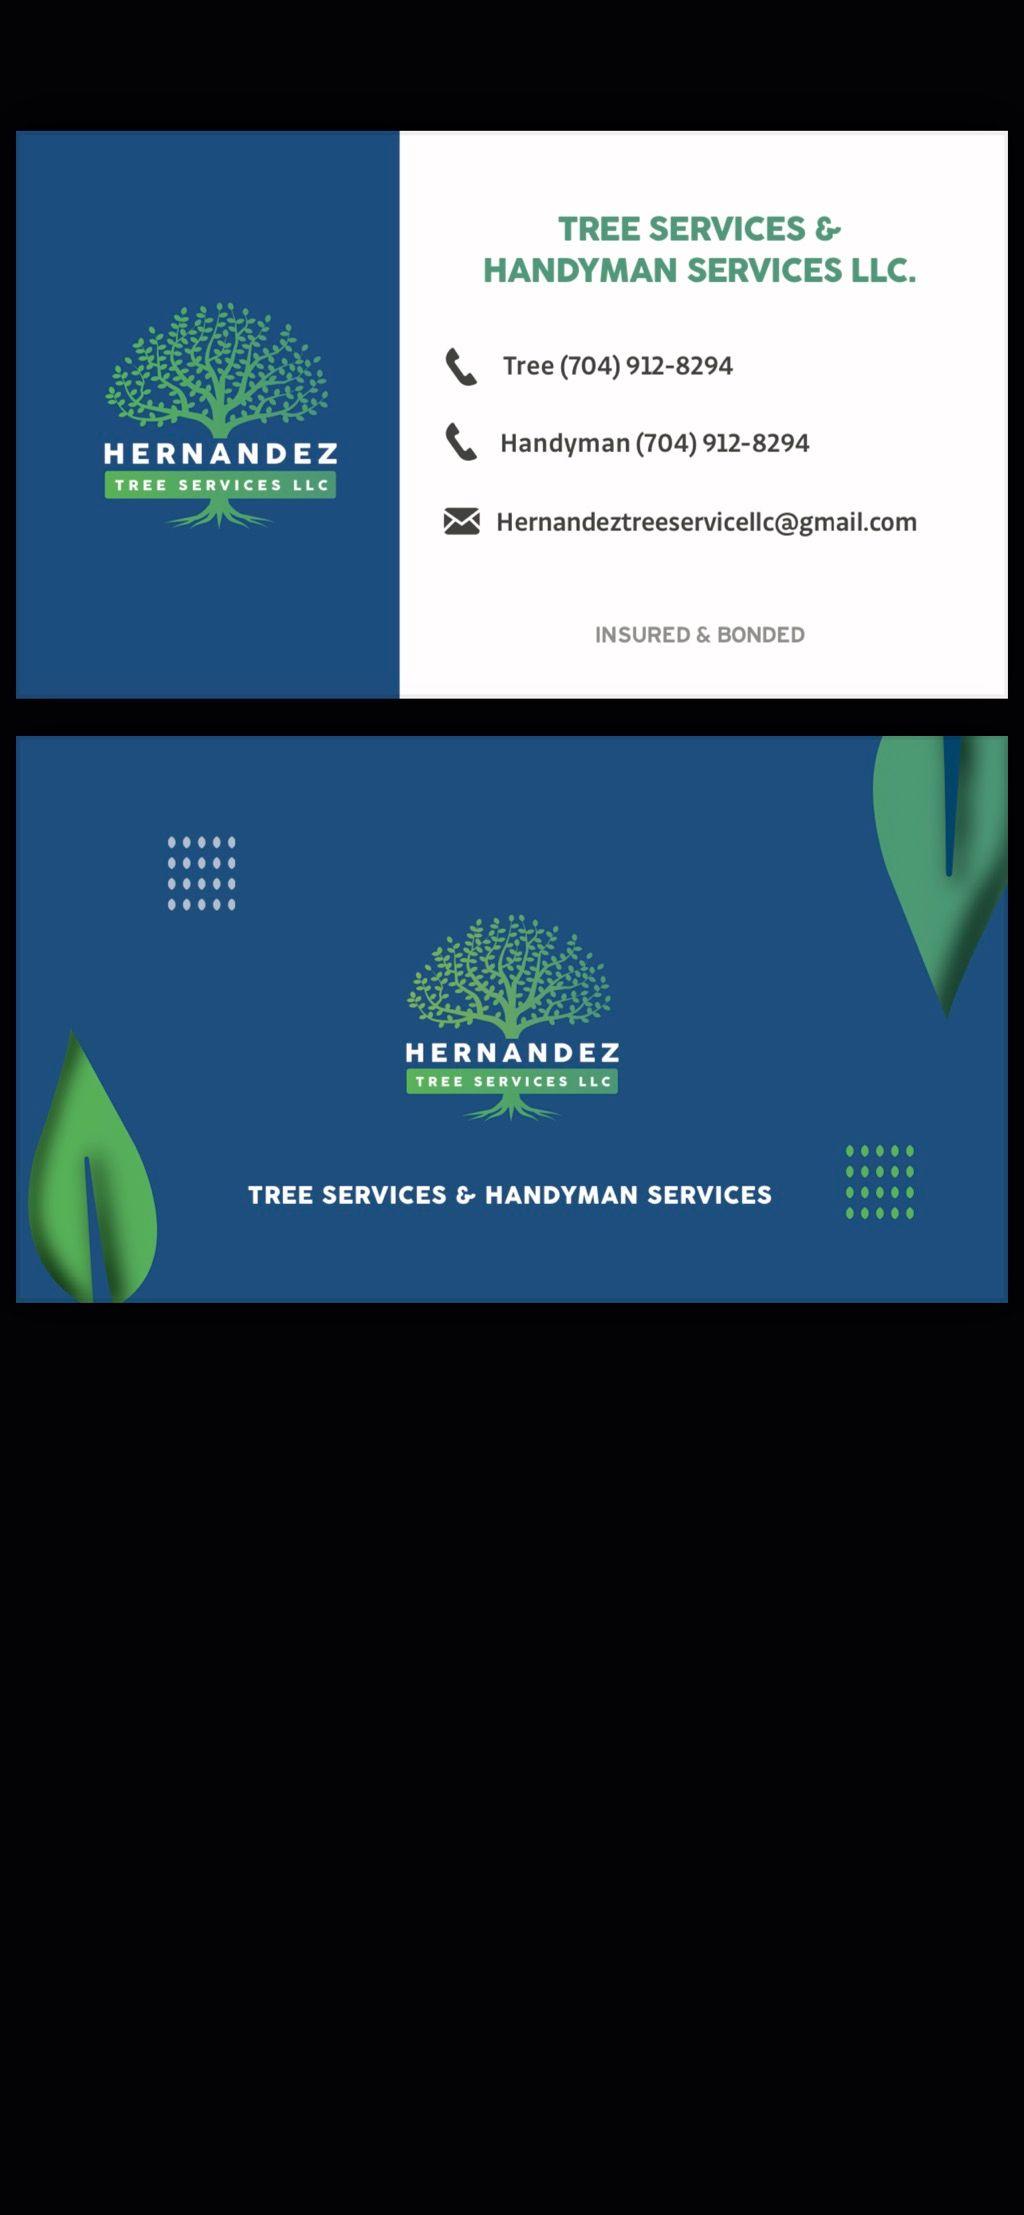 Hernandez  tree services LLC